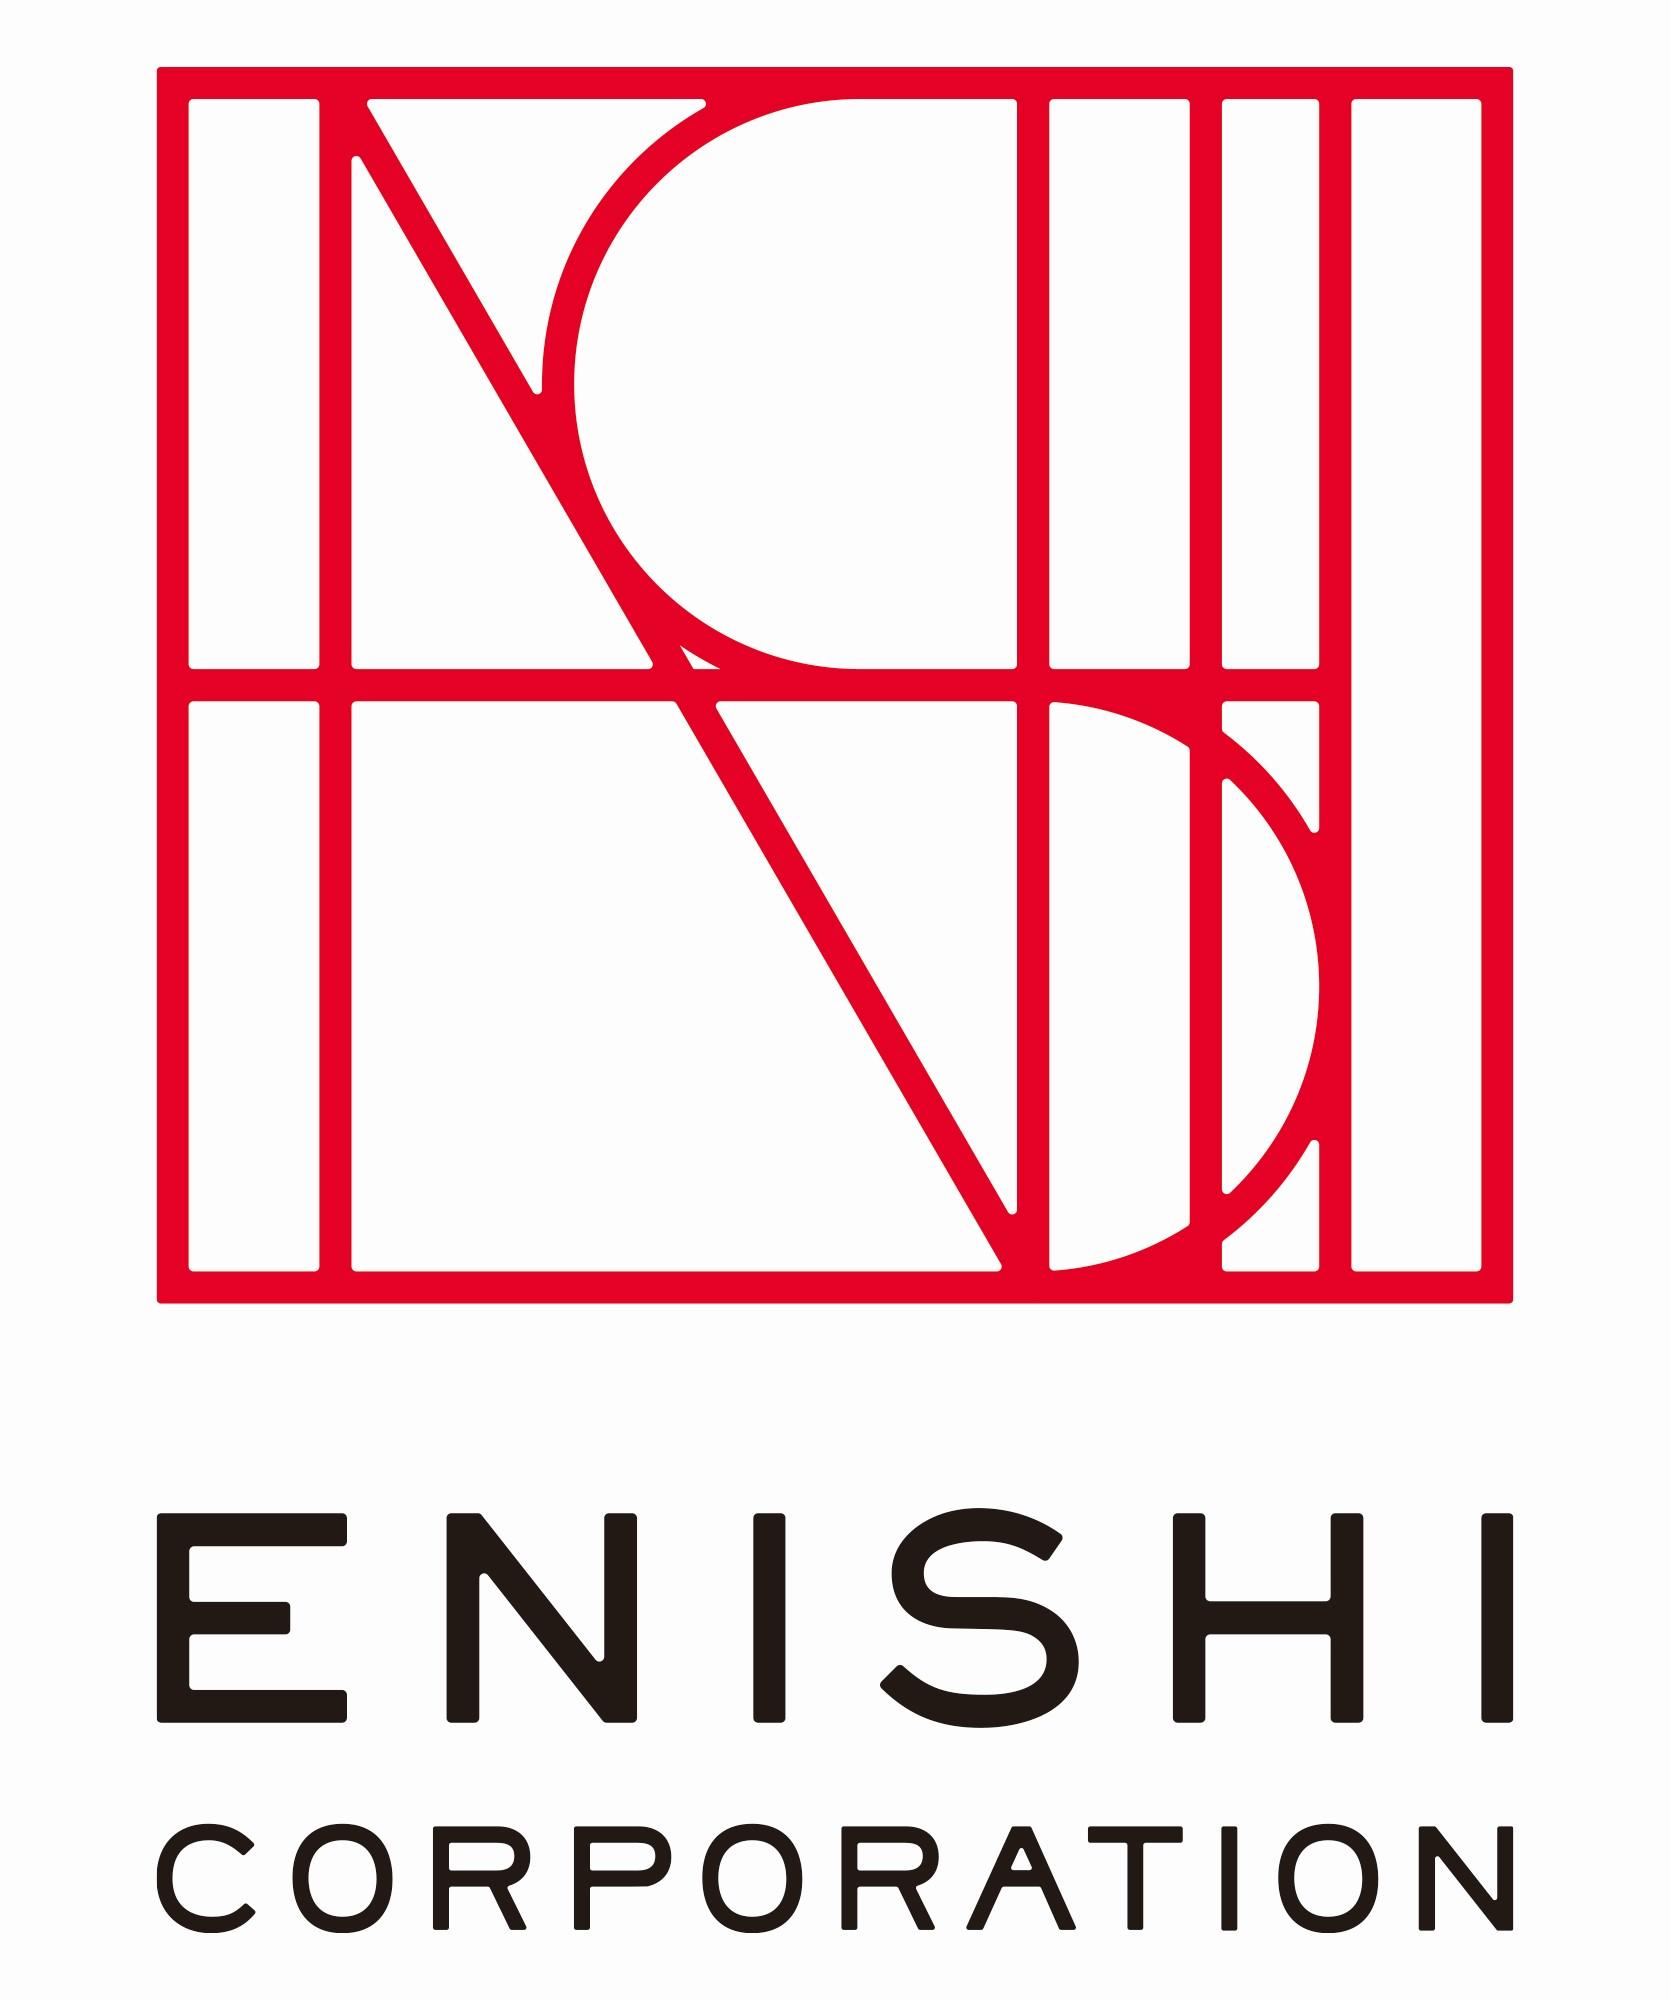 Enishi vi 02 %e7%9f%a9%e5%bd%a22 co.%e8%a1%a8%e8%a8%98